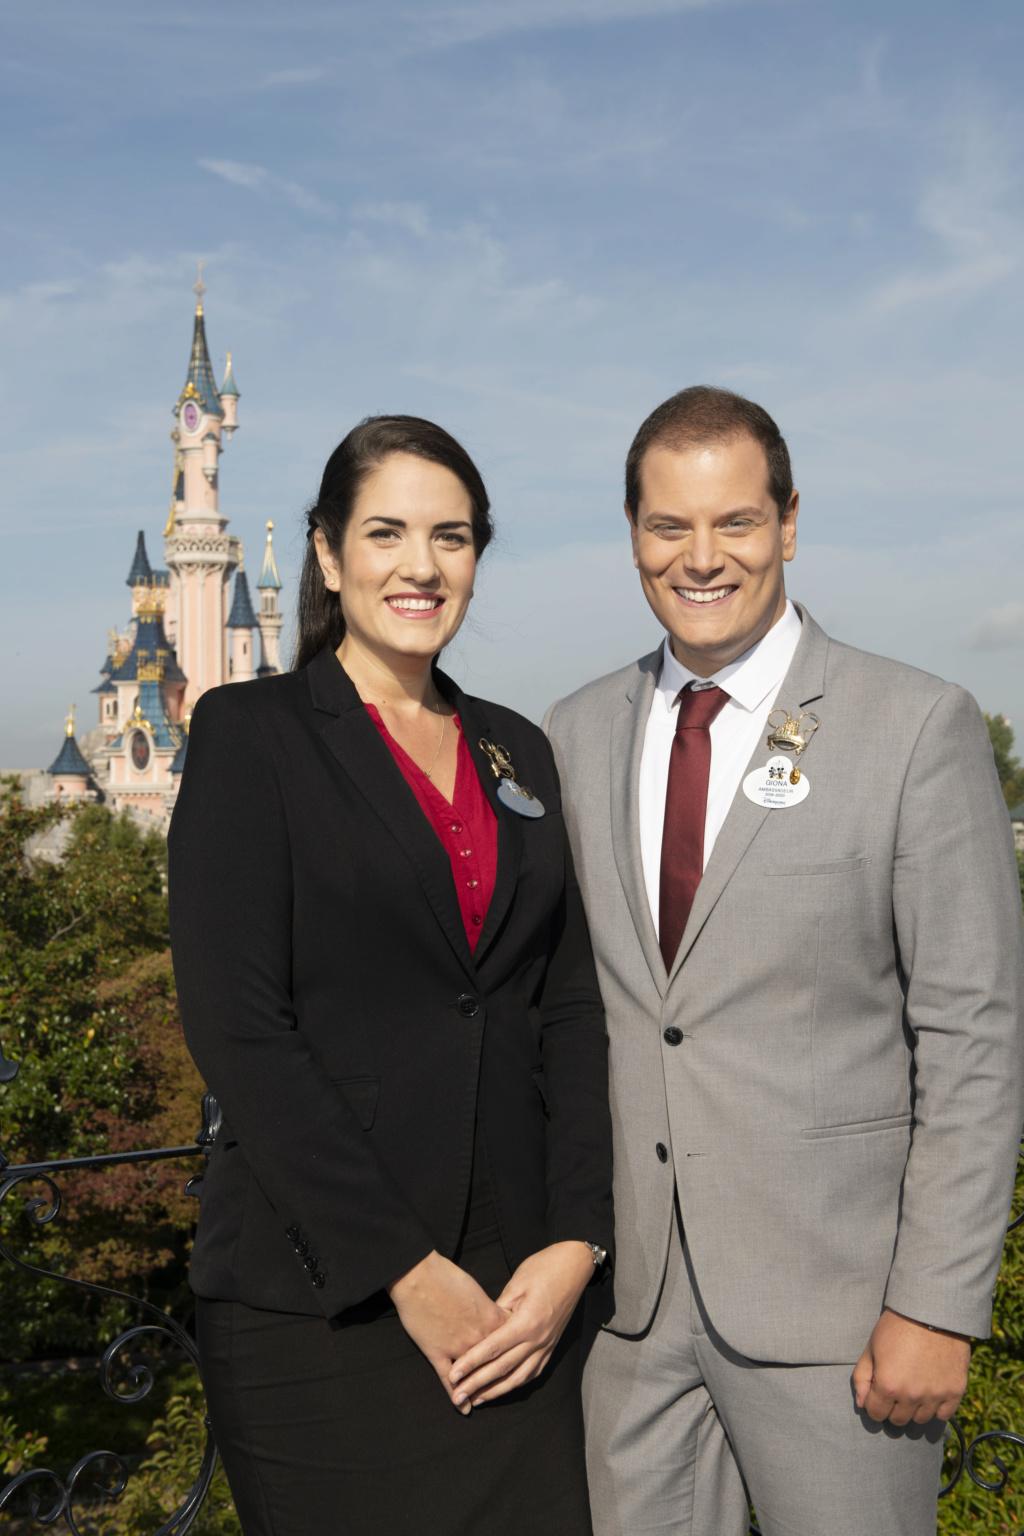 Ambasciatori Disneyland Paris 2019 - 2020 00211